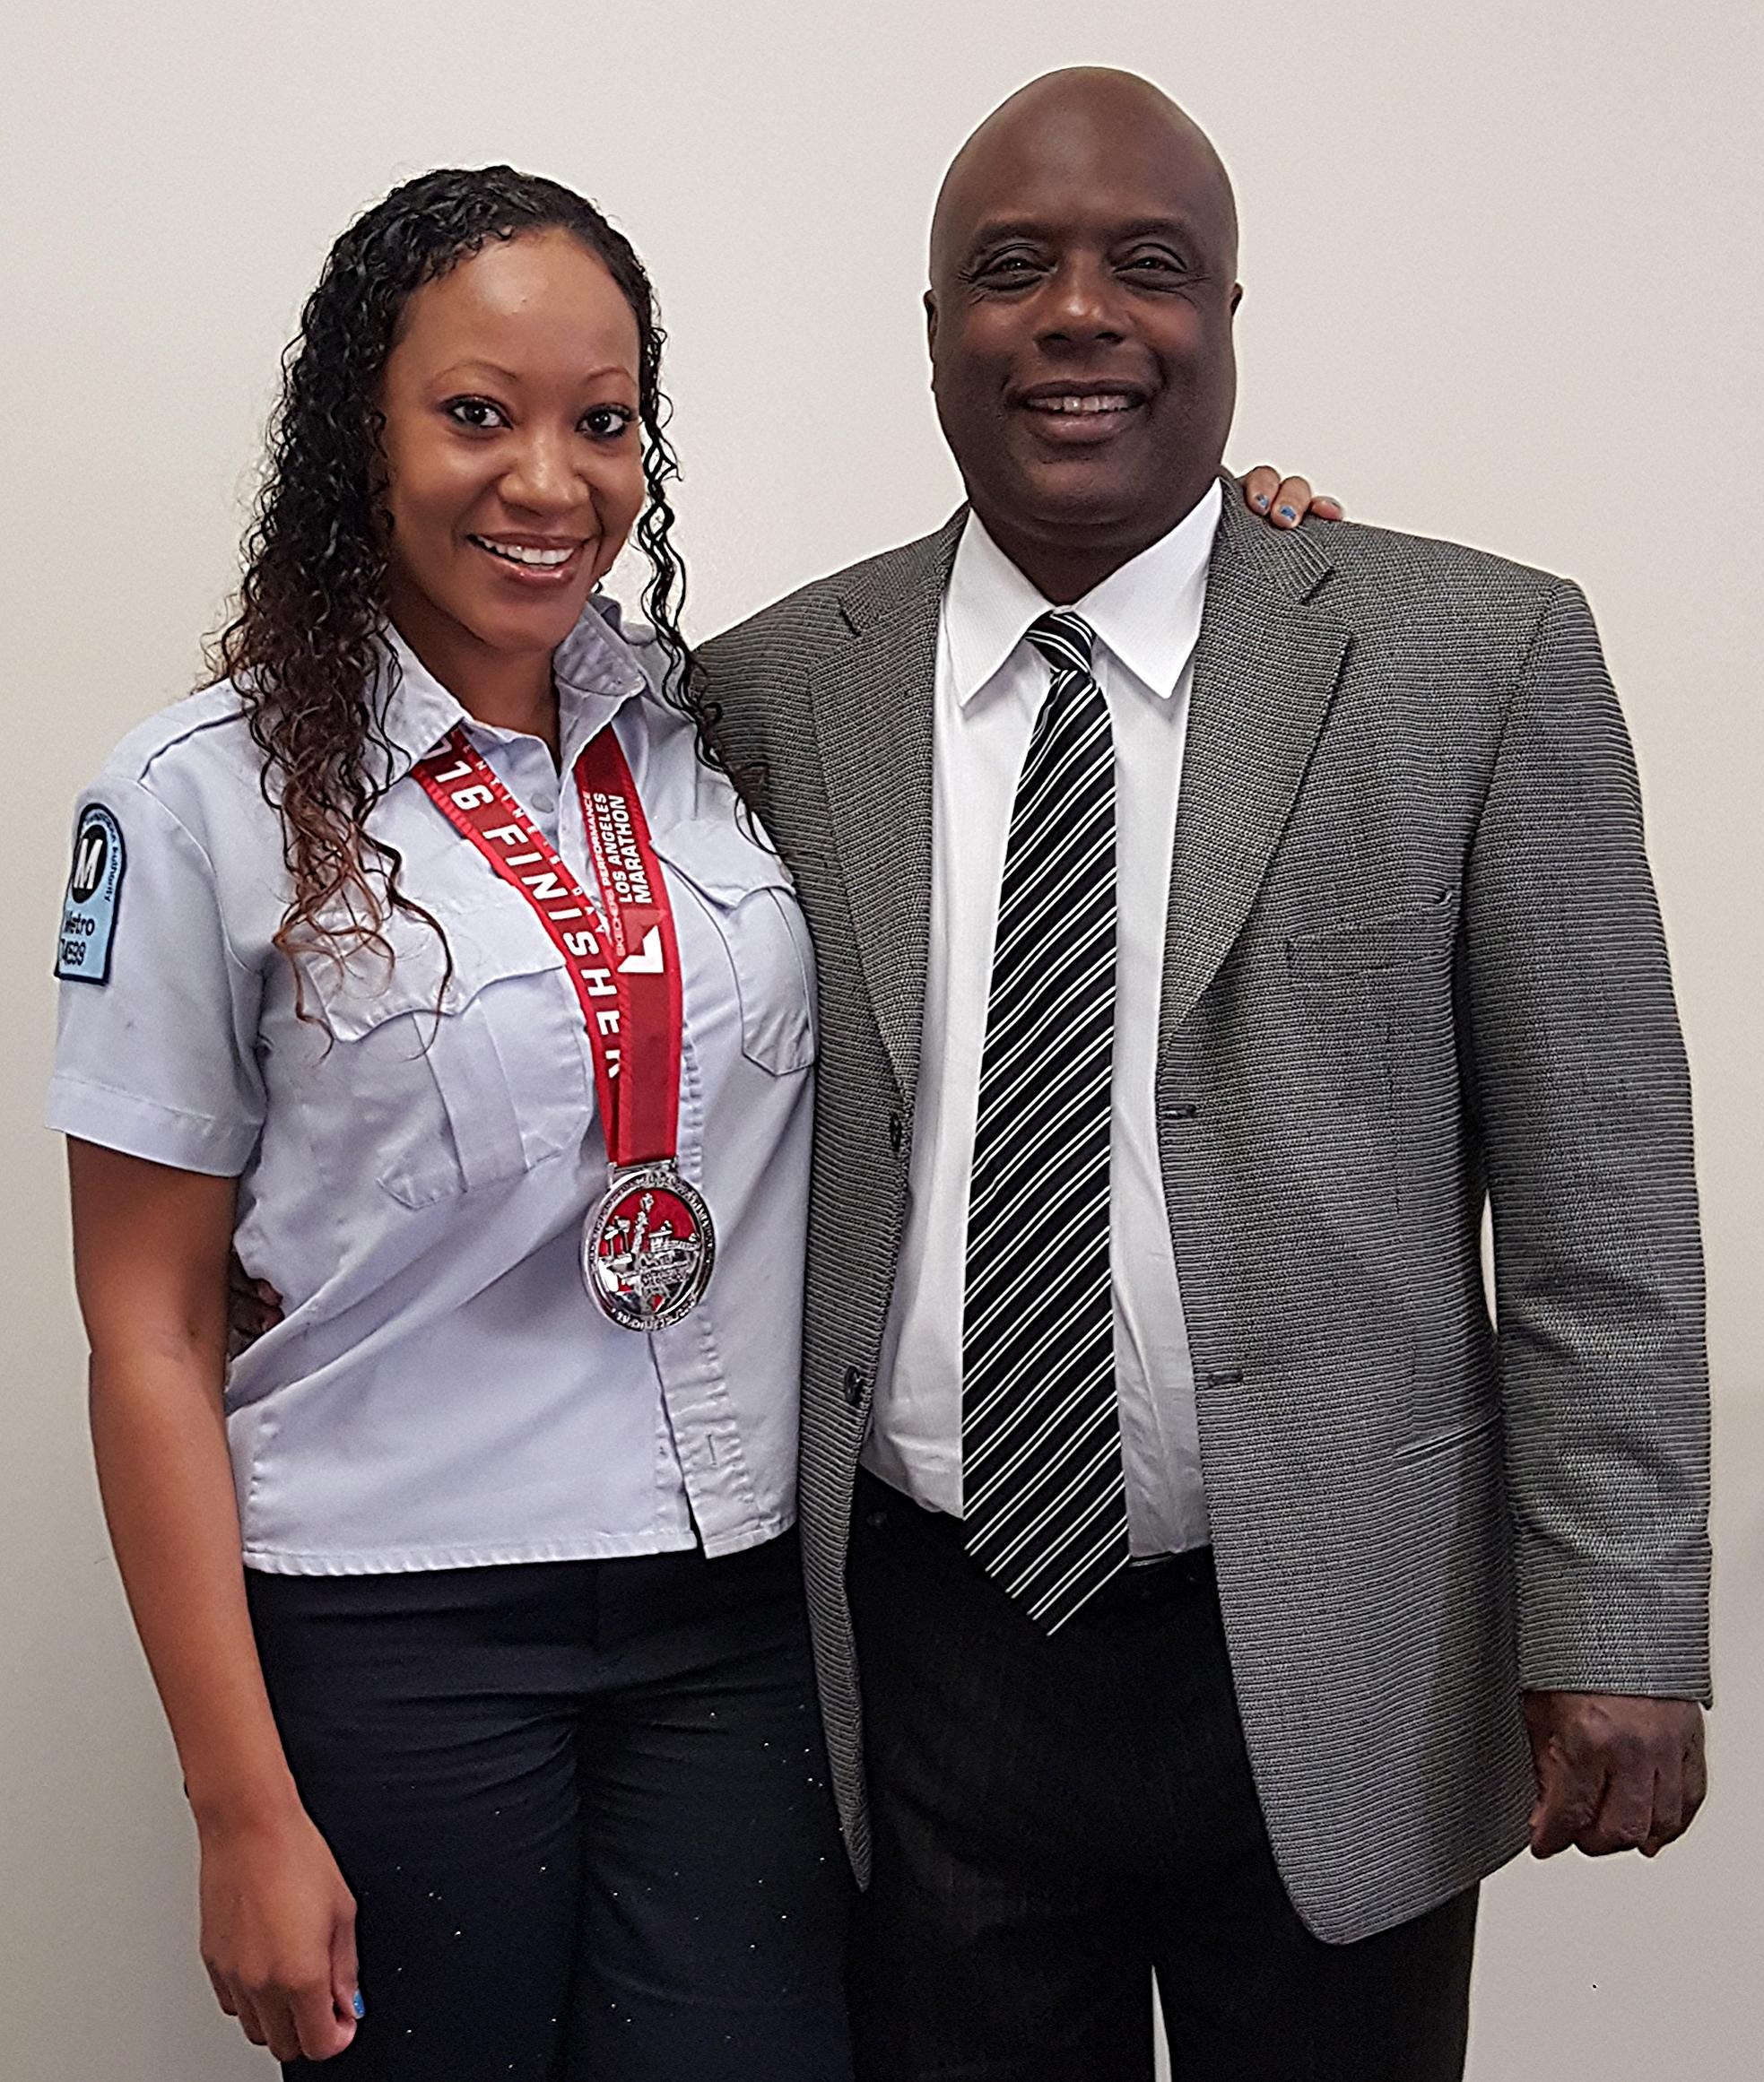 Congratulations to Naomi Smith for completing the 2016 LA Marathon.